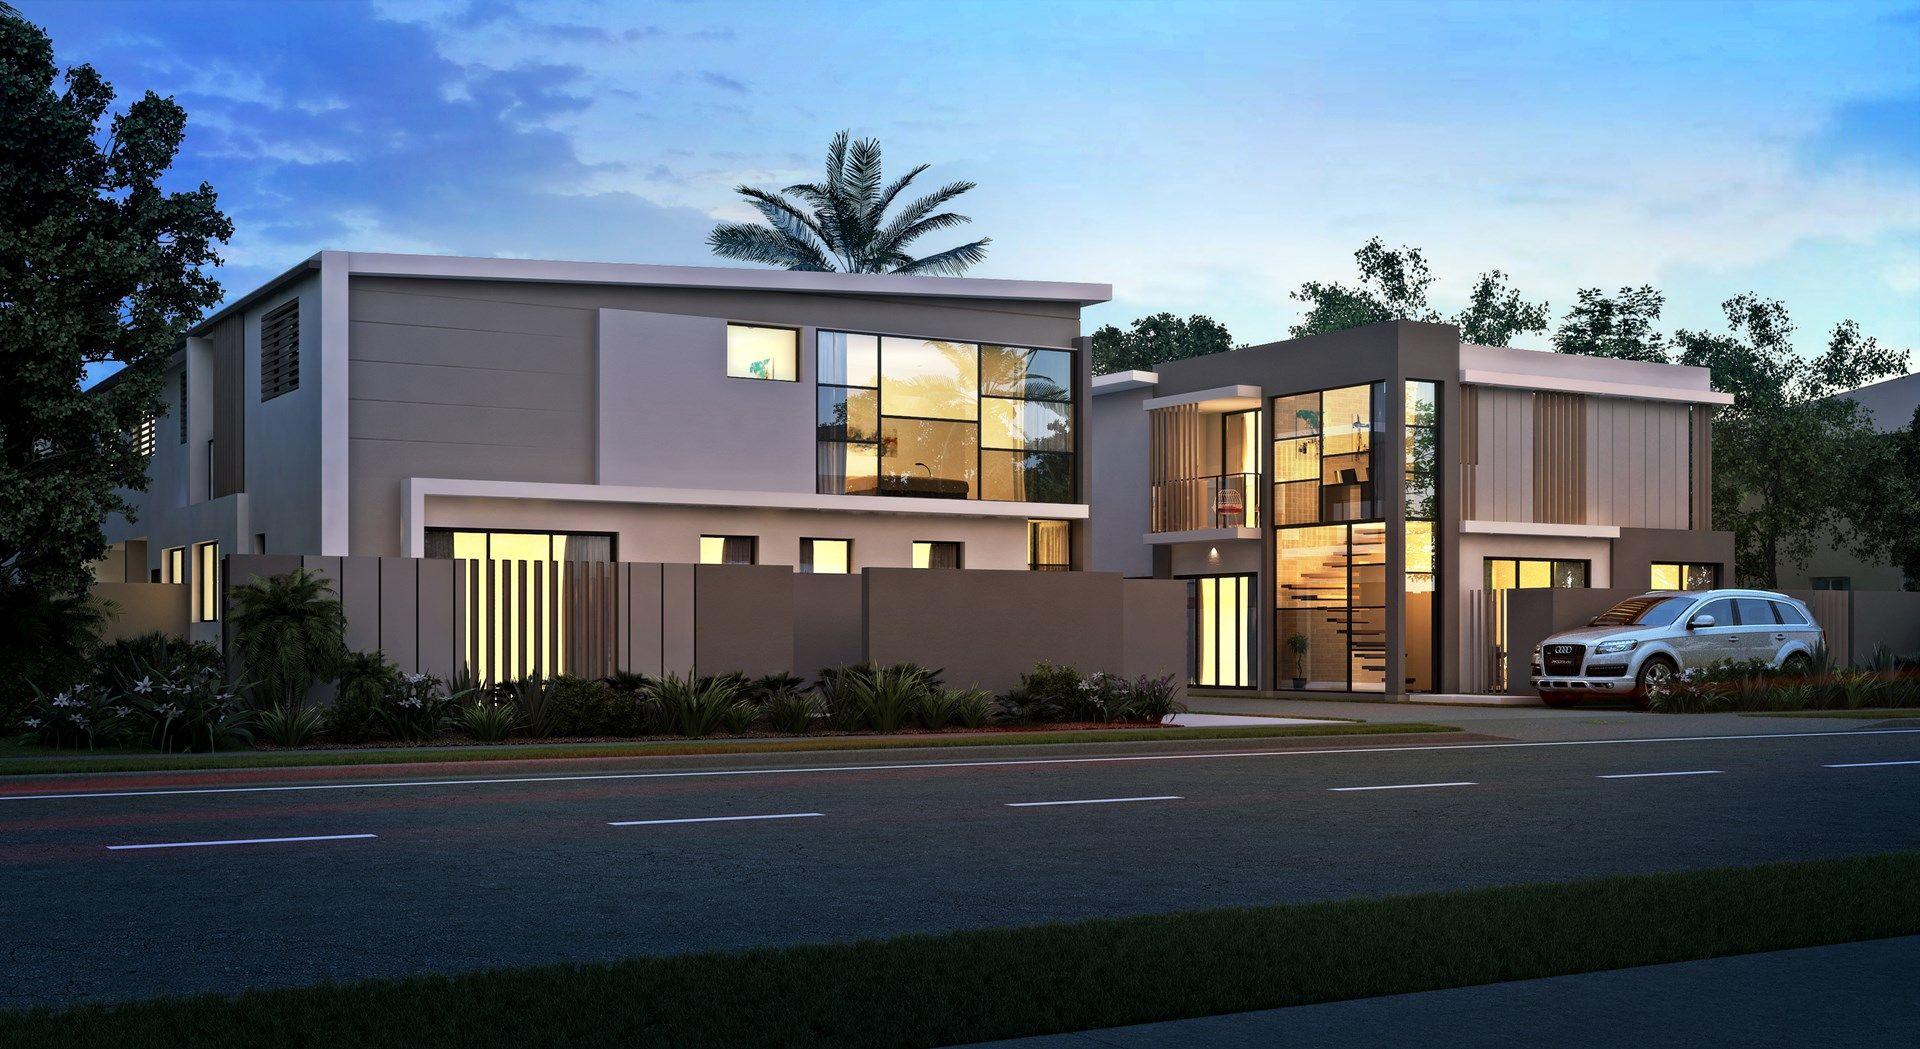 7/115 York Street, Nundah QLD 4012, Image 0